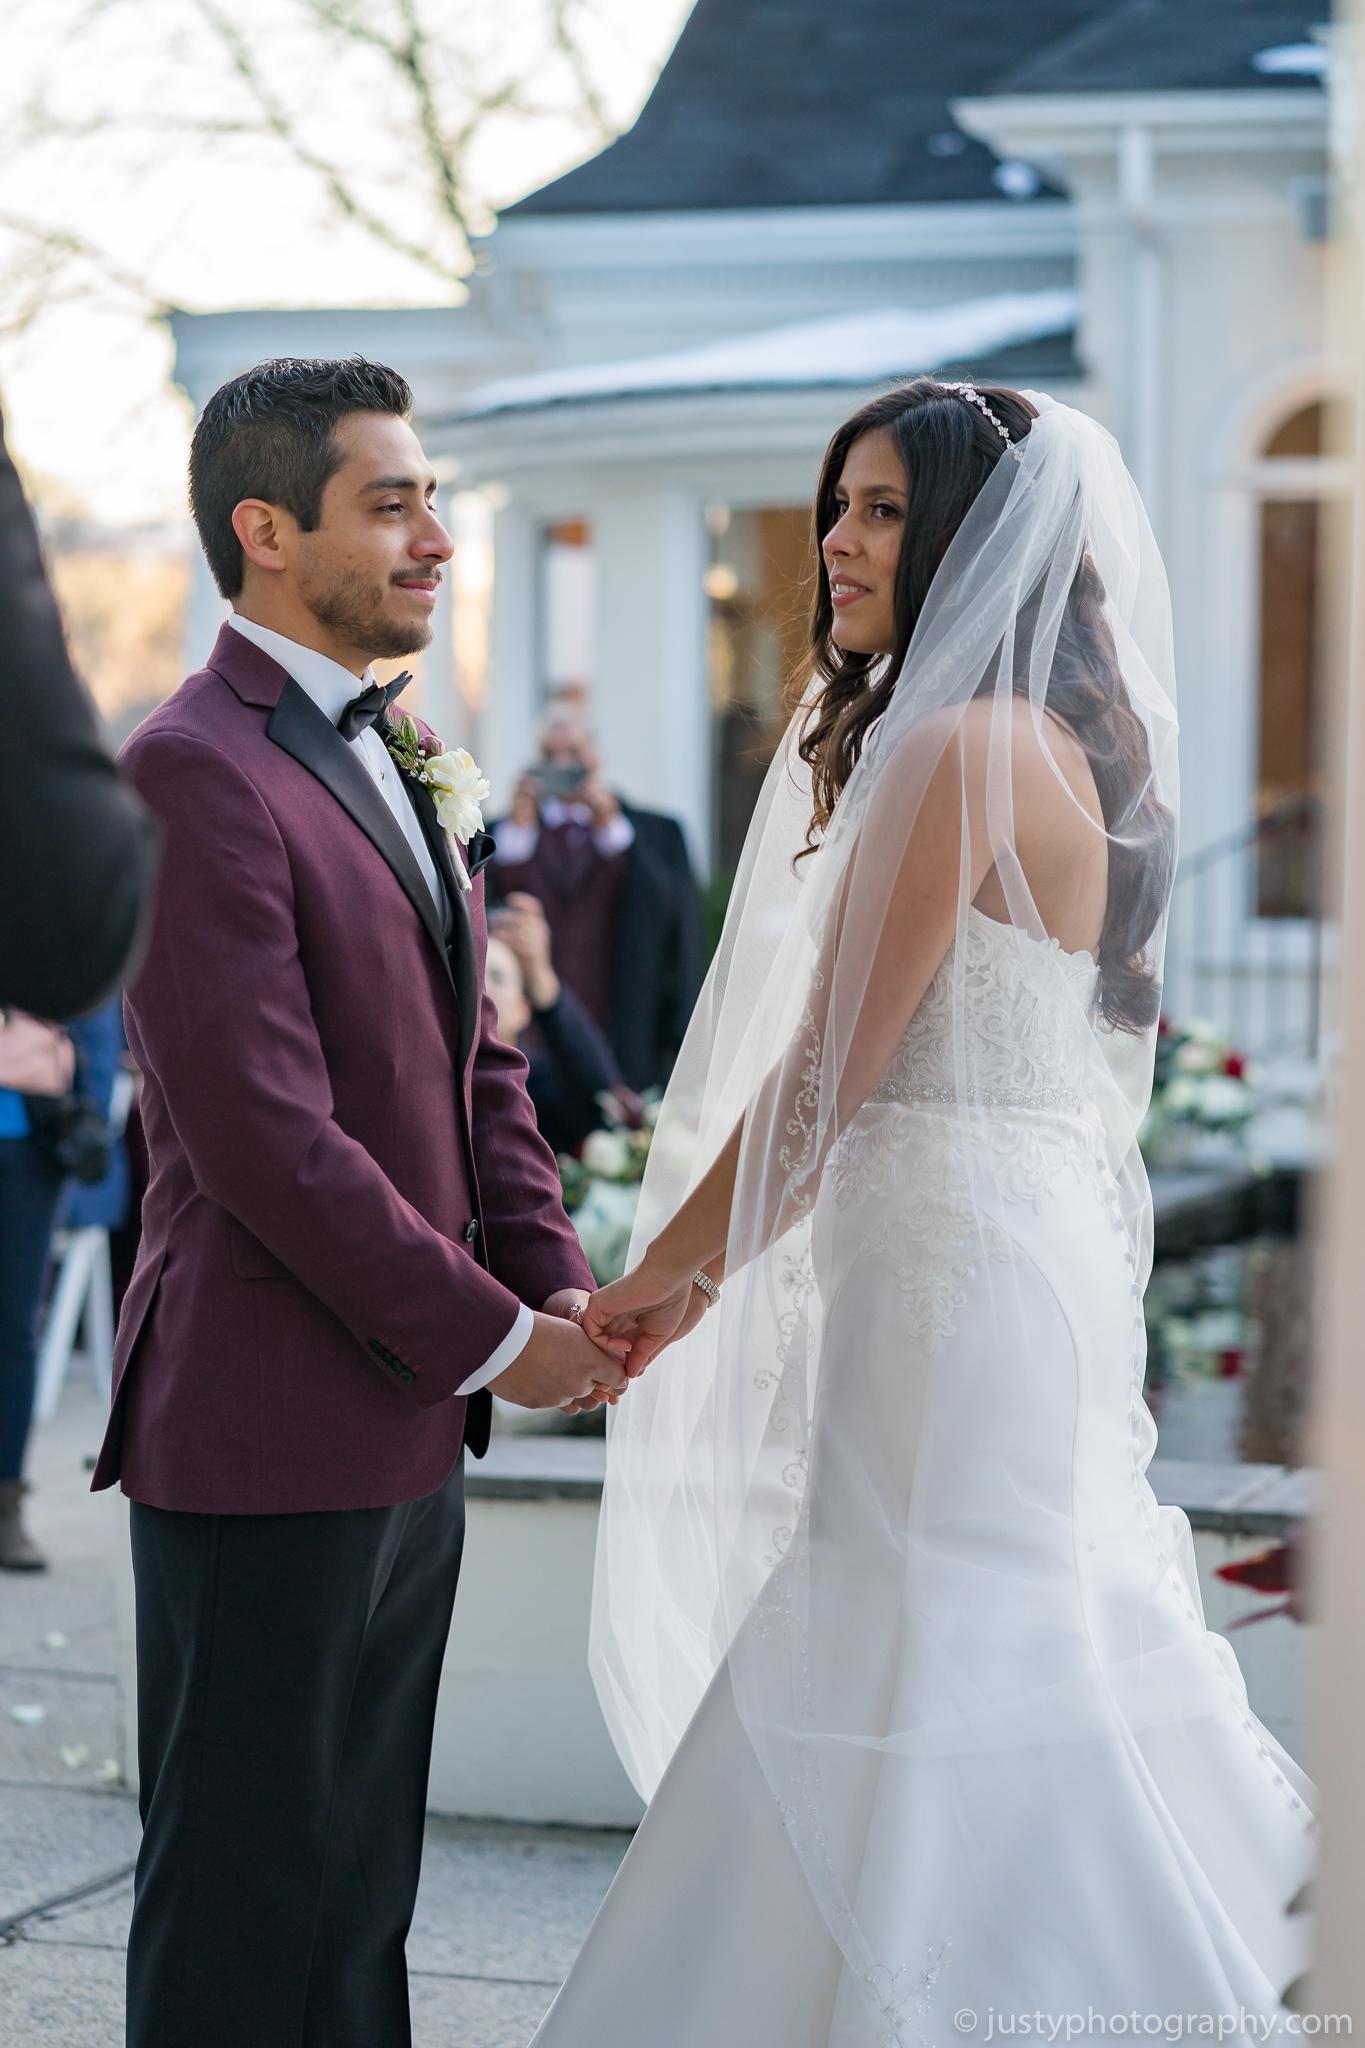 Ceresville Mansion Wedding Photos-Ceremony Bride and Groom.jpg